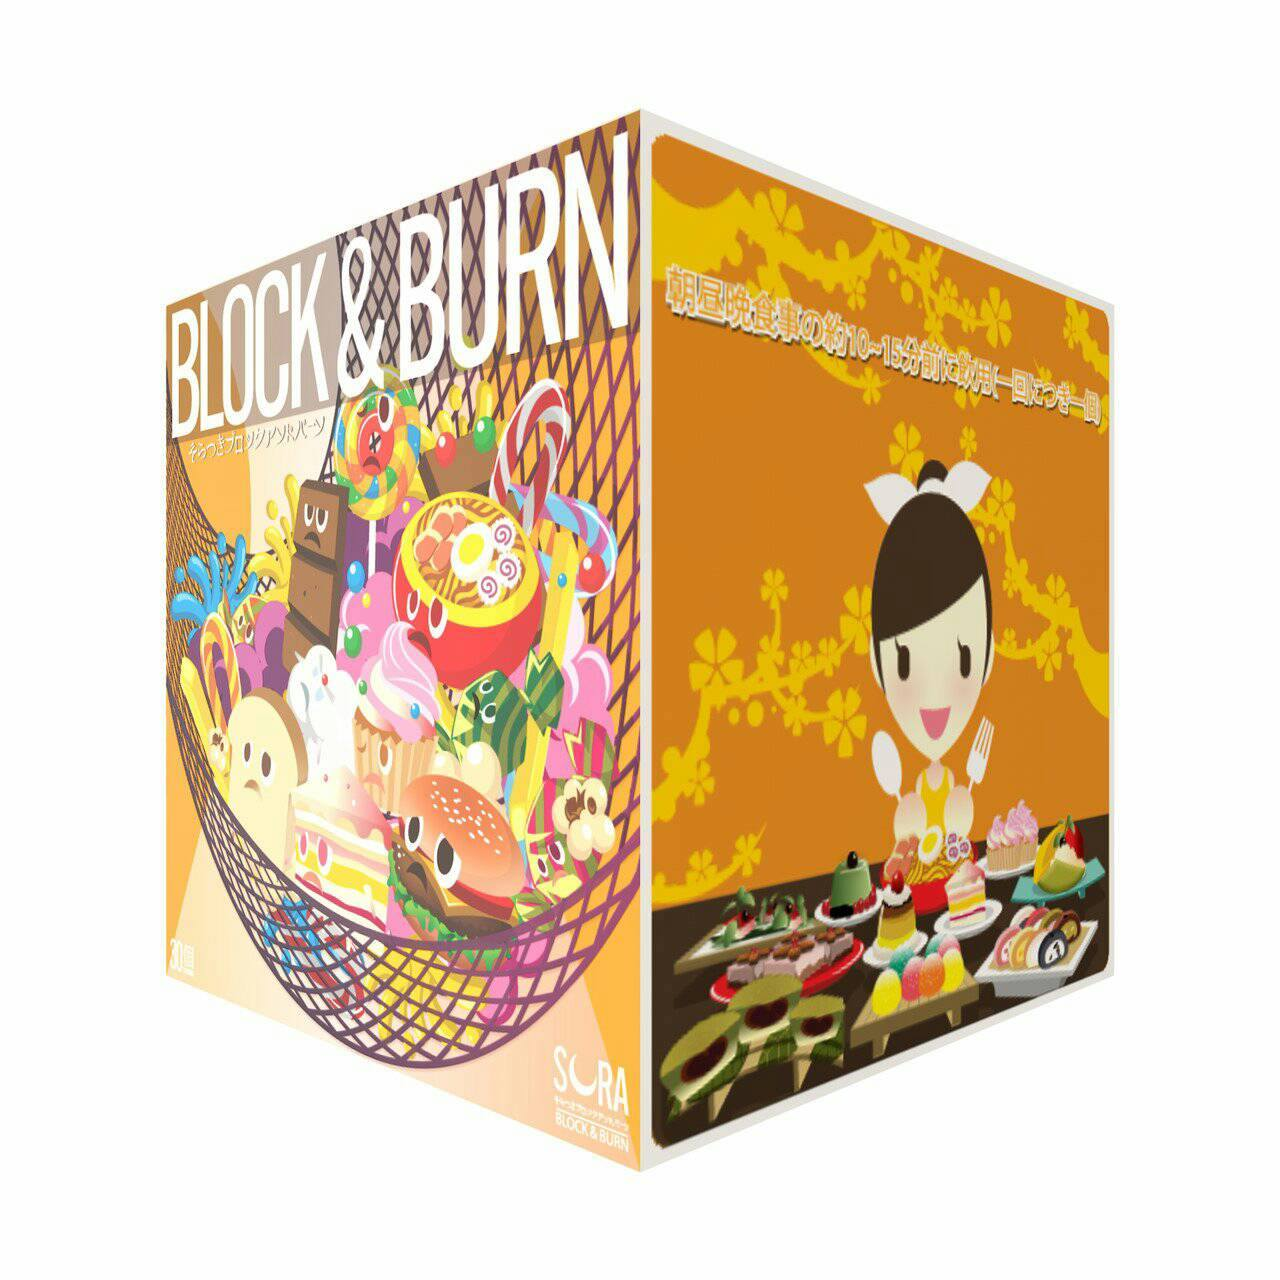 Block & Burn บล็อกแอนด์เบิร์น ผลิตภัณฑ์อาหารเสริมป้องกันและลดน้ำหนัก